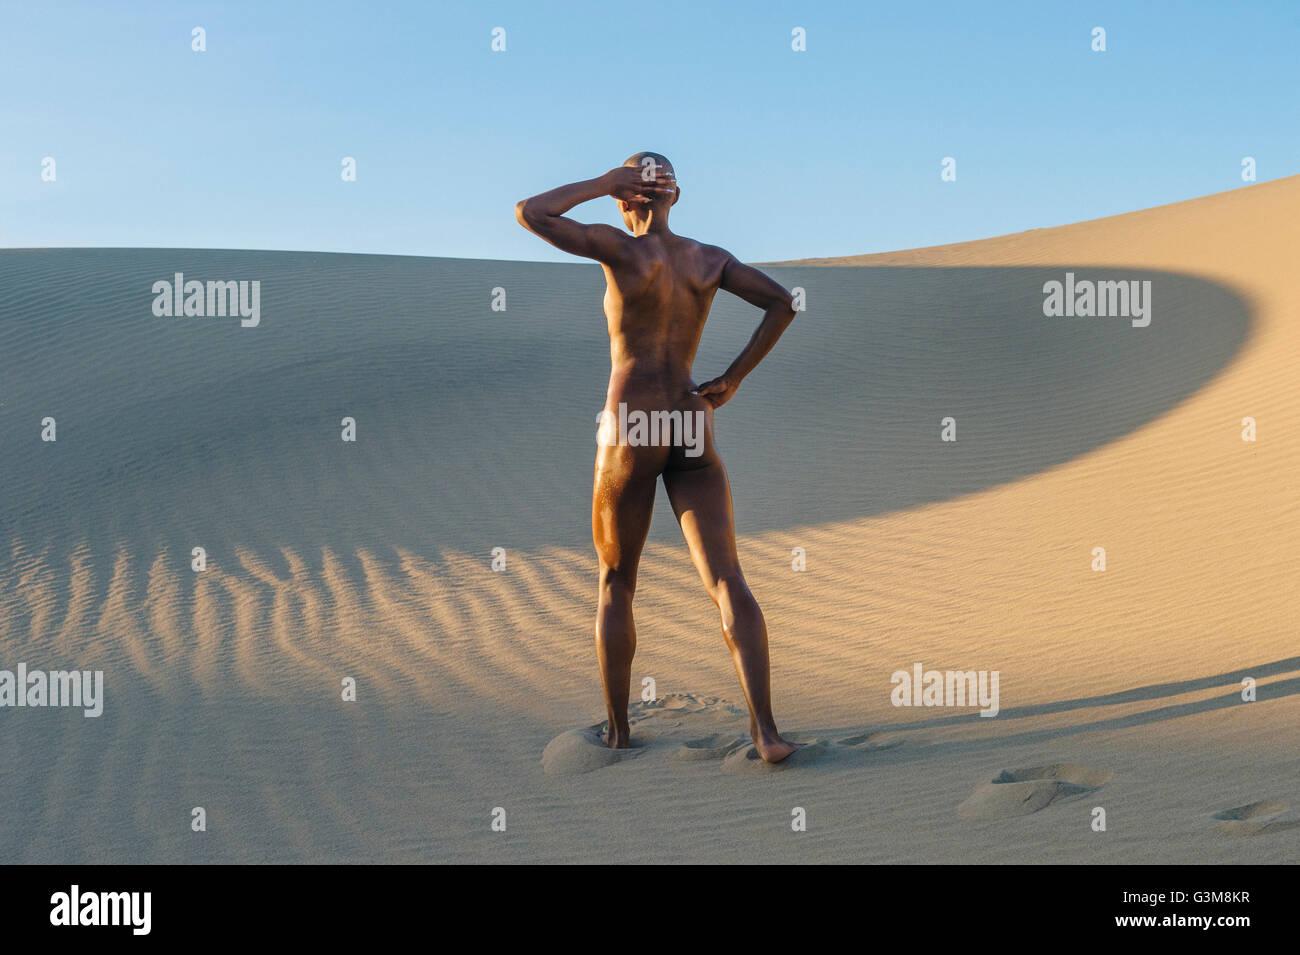 Nude woman standing in desert - Stock Image